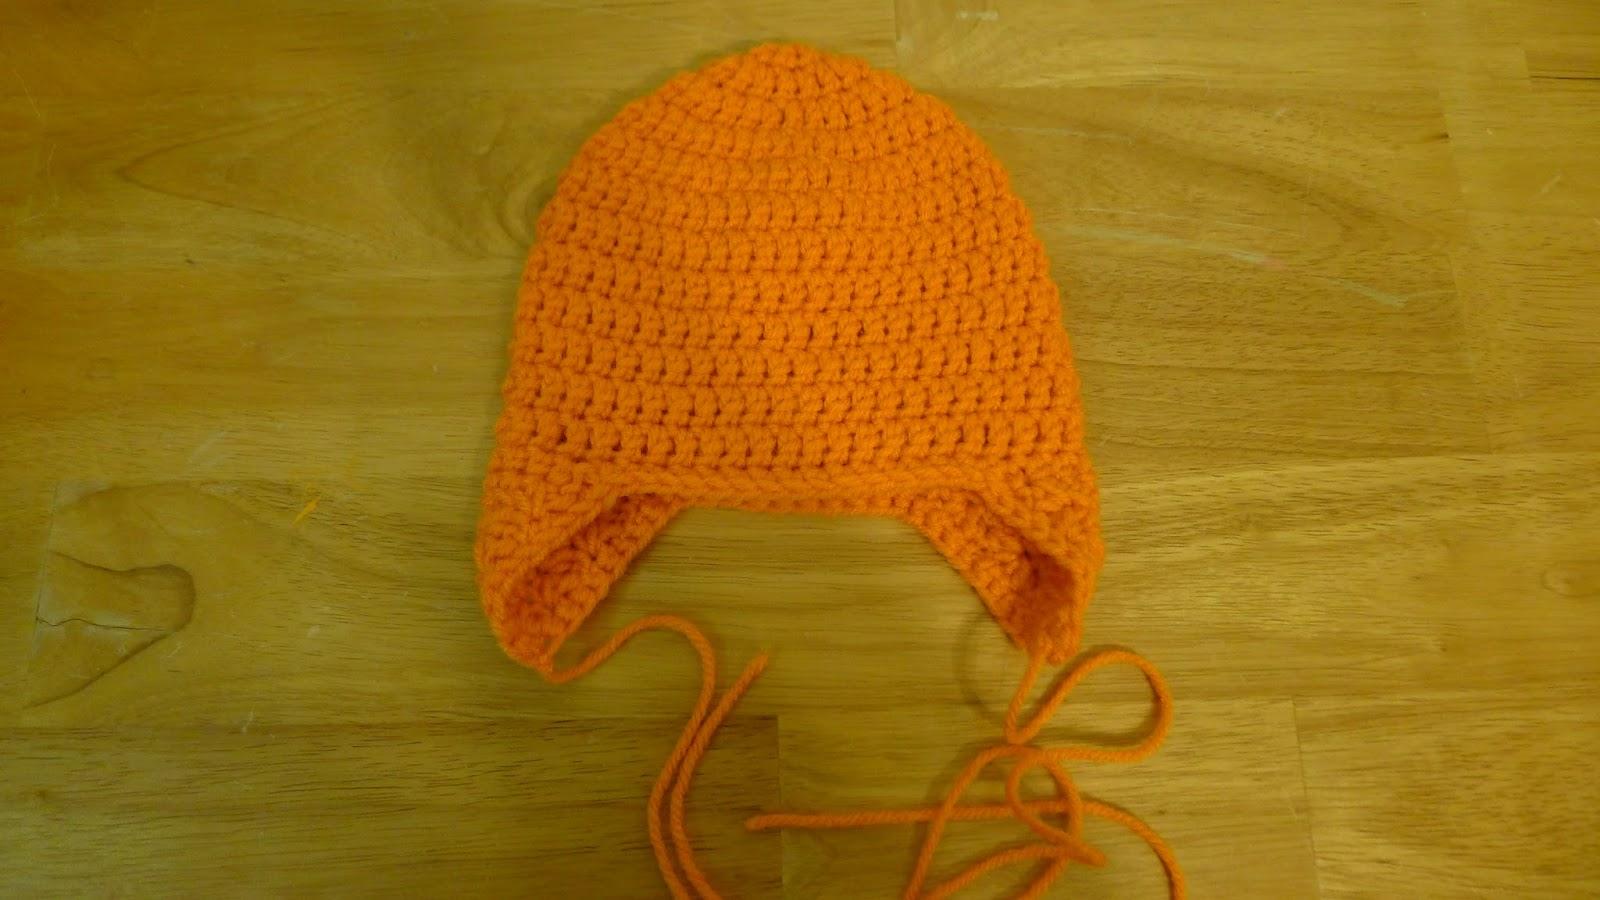 mnopxs2 the blog: Crochet Clownfish Hat